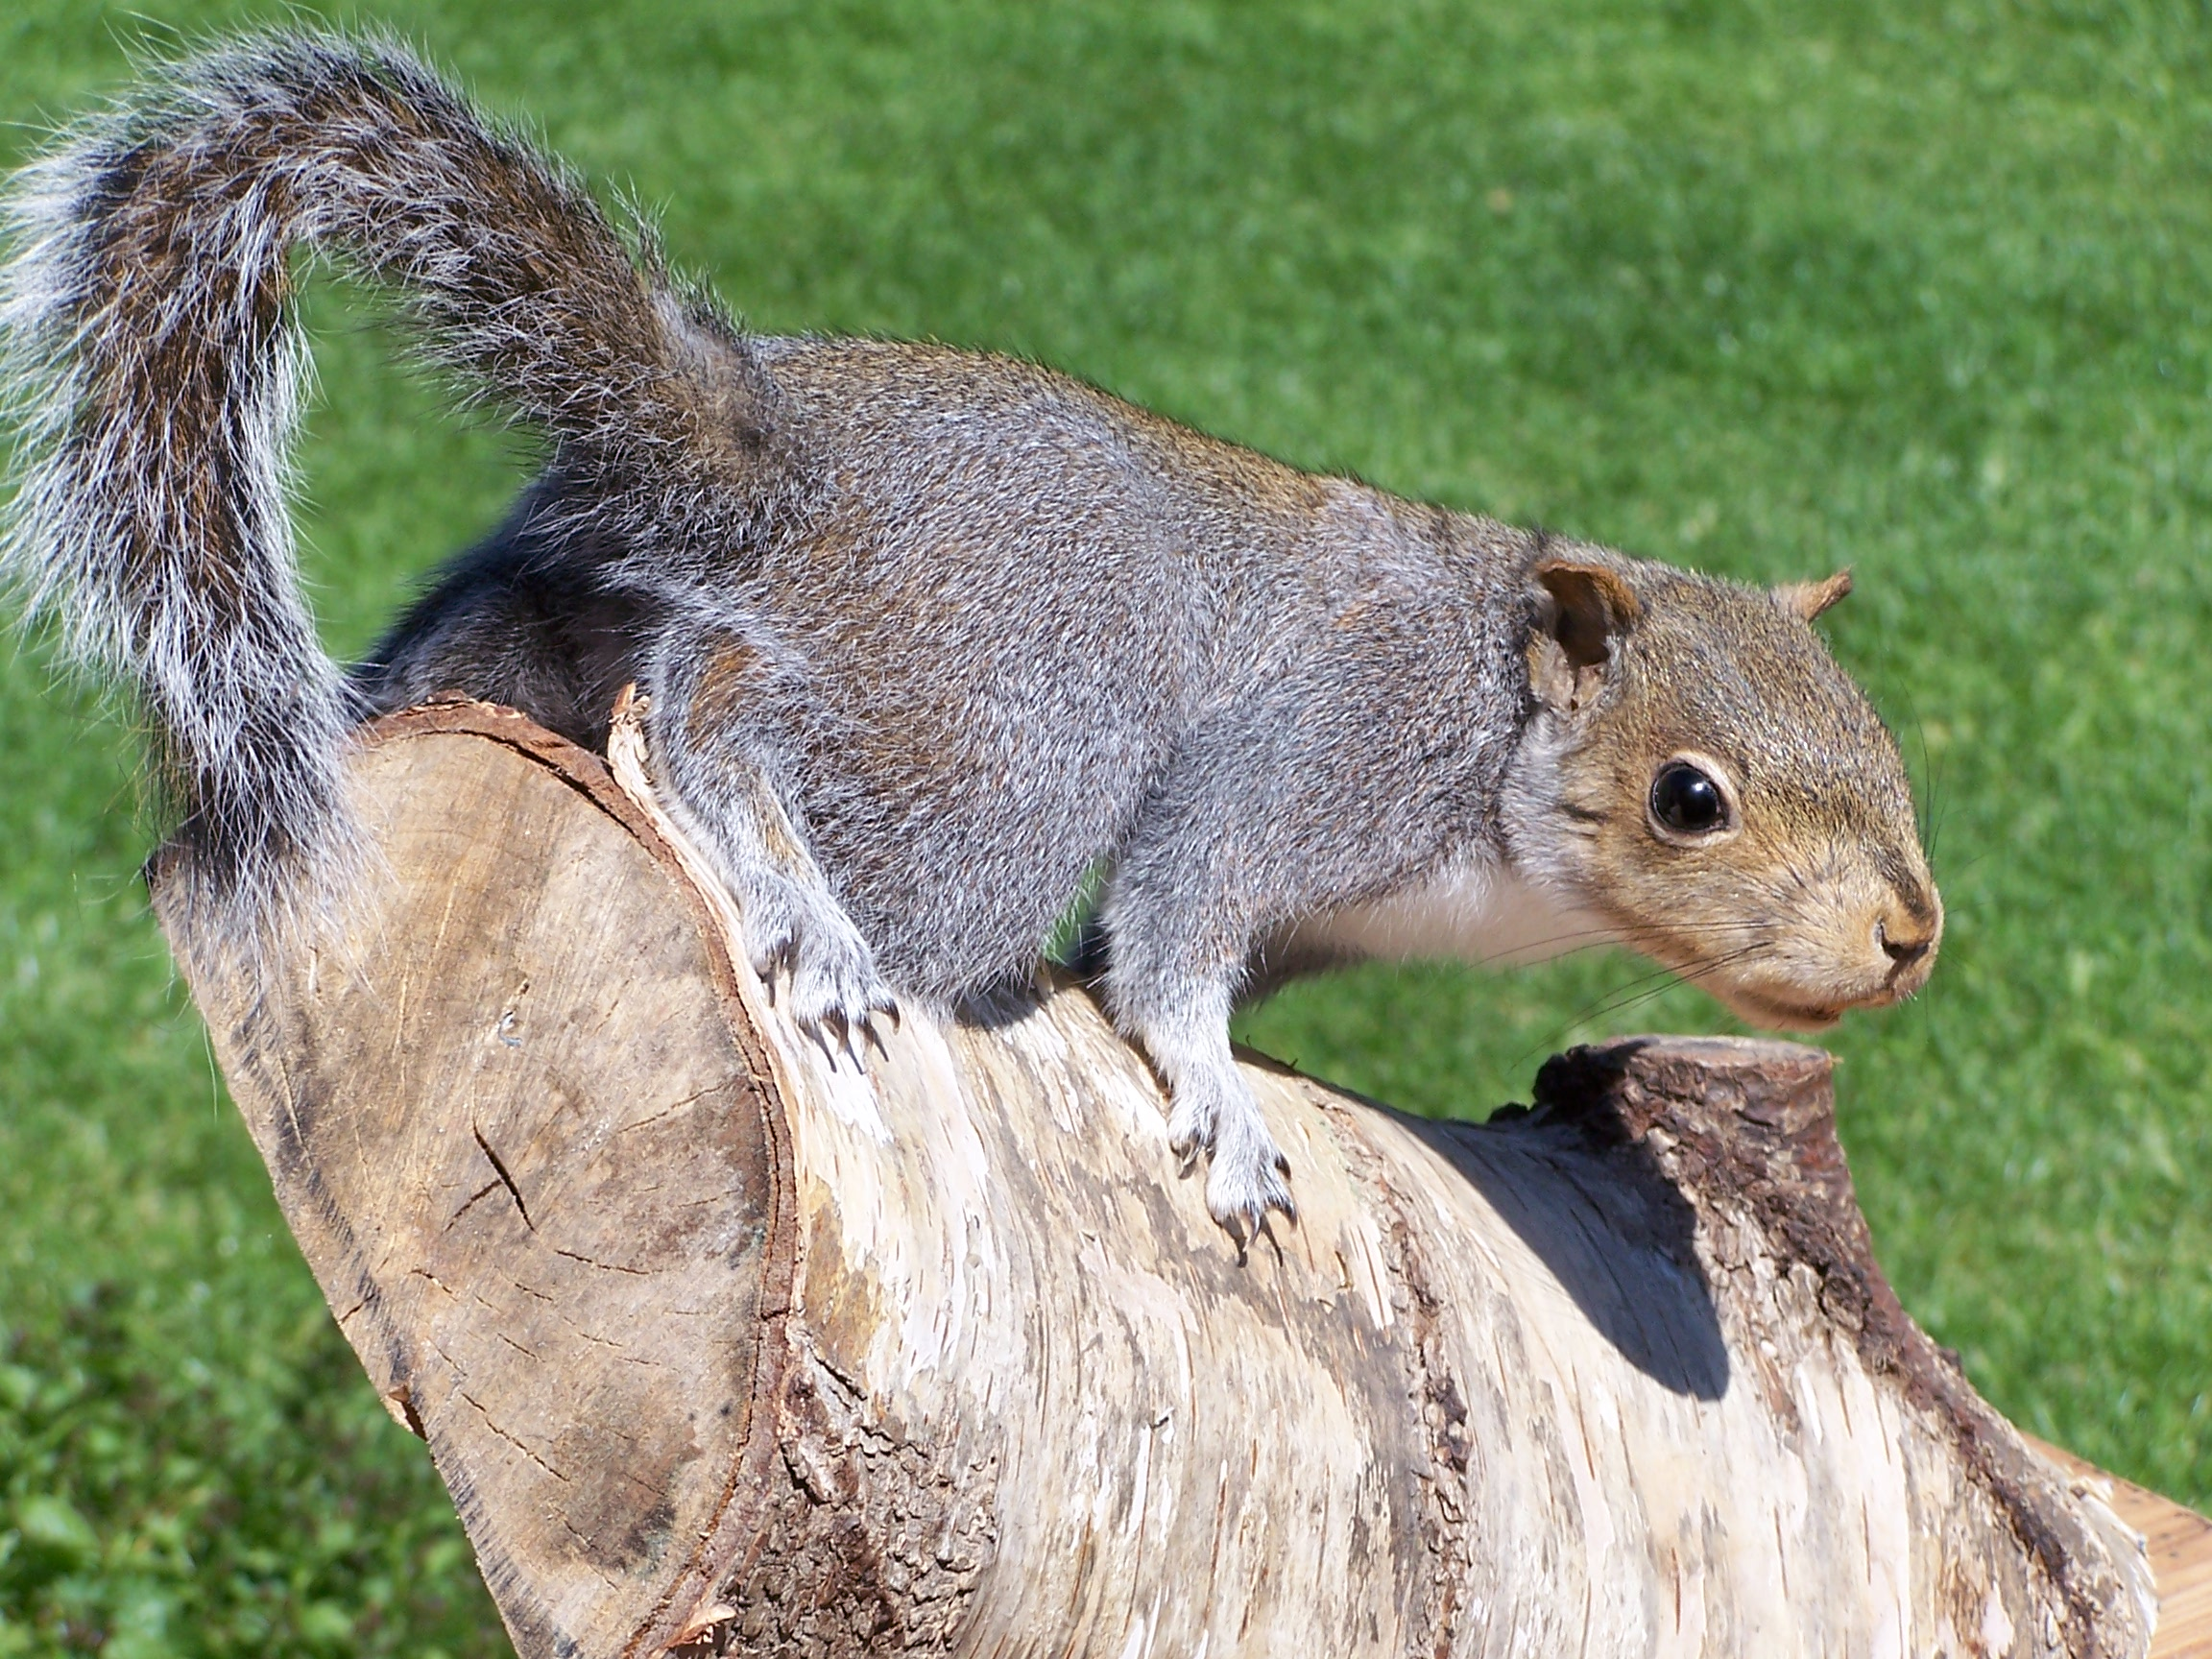 mammals/greysquirrel.jpg